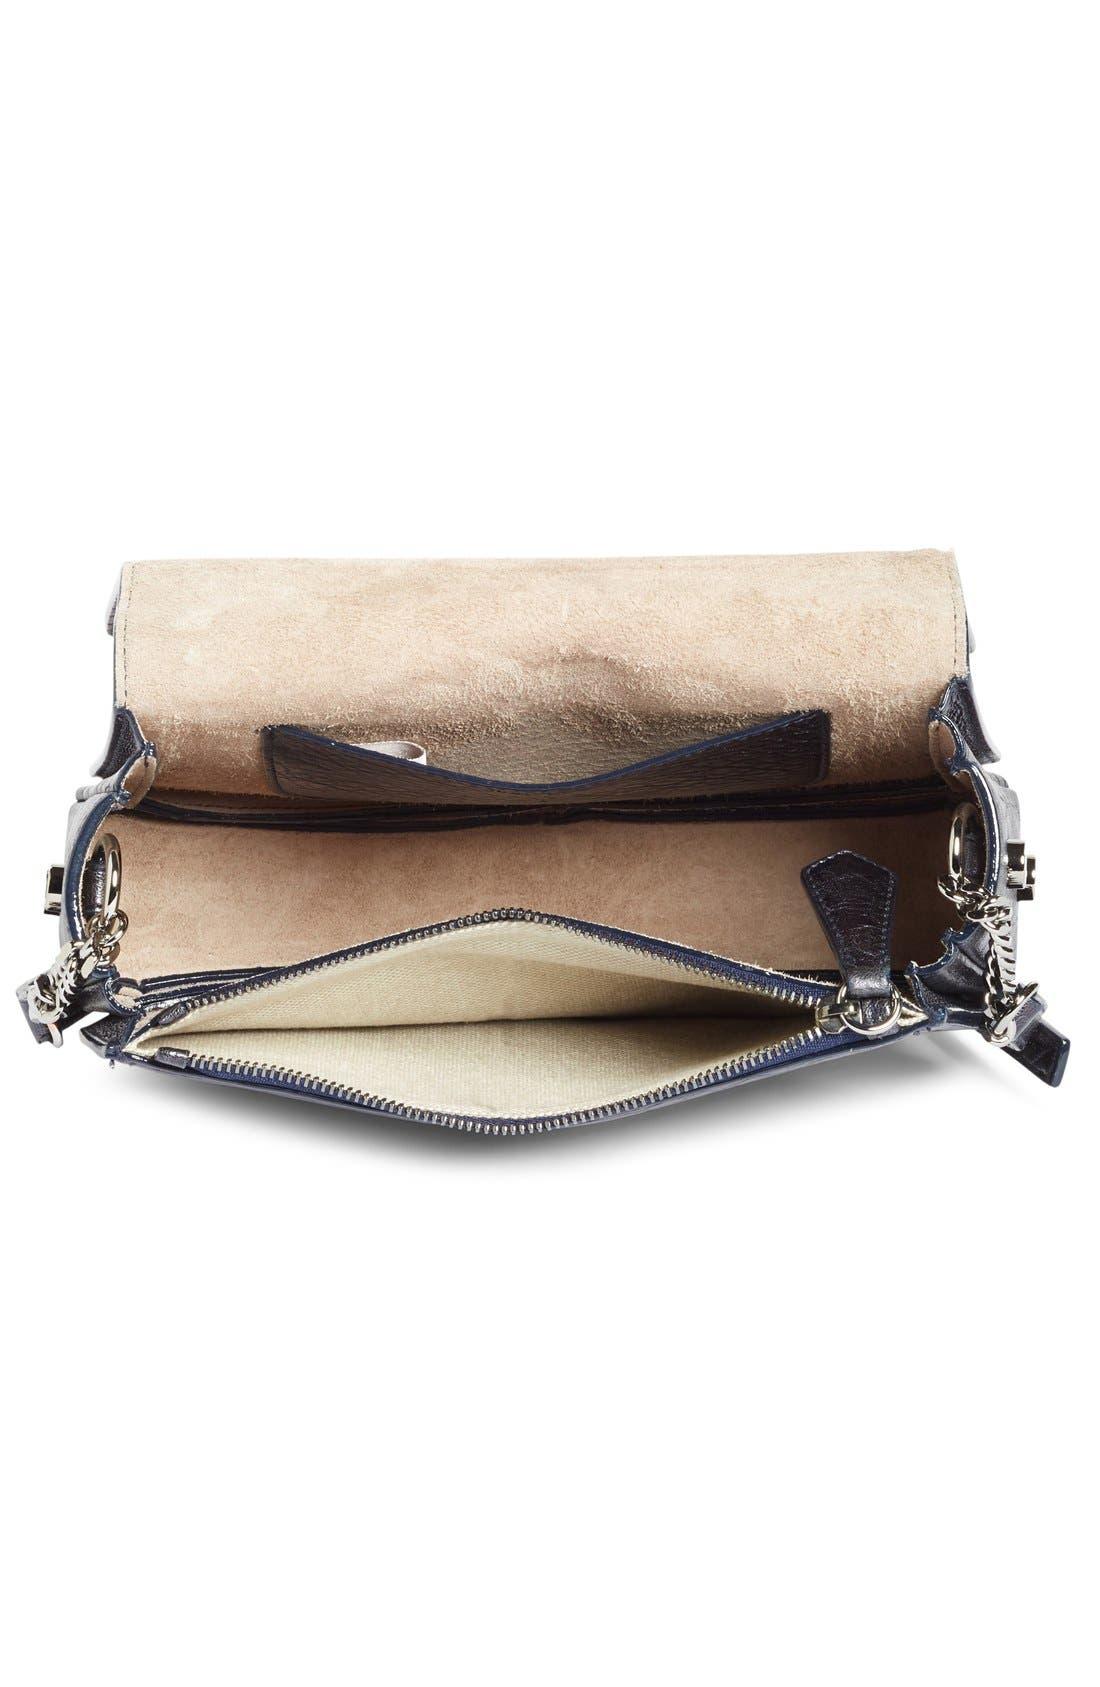 Alternate Image 2  - Jimmy Choo Arrow Metallic Grained Leather Shoulder Bag